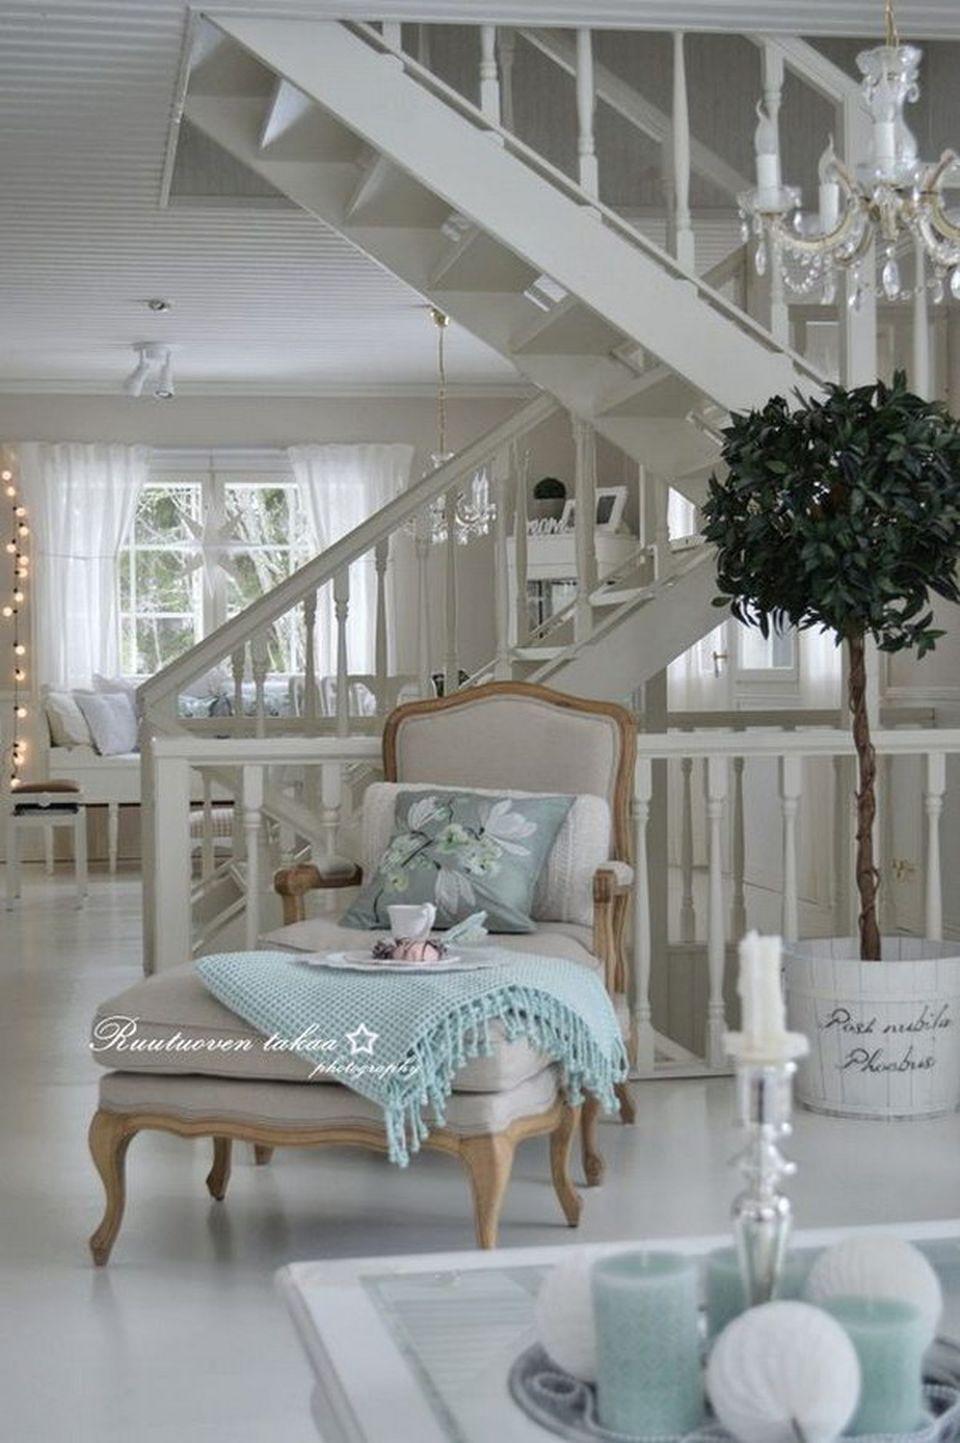 Esszimmermöbel design  vintage shabby chic living room decorations ideas  chaise